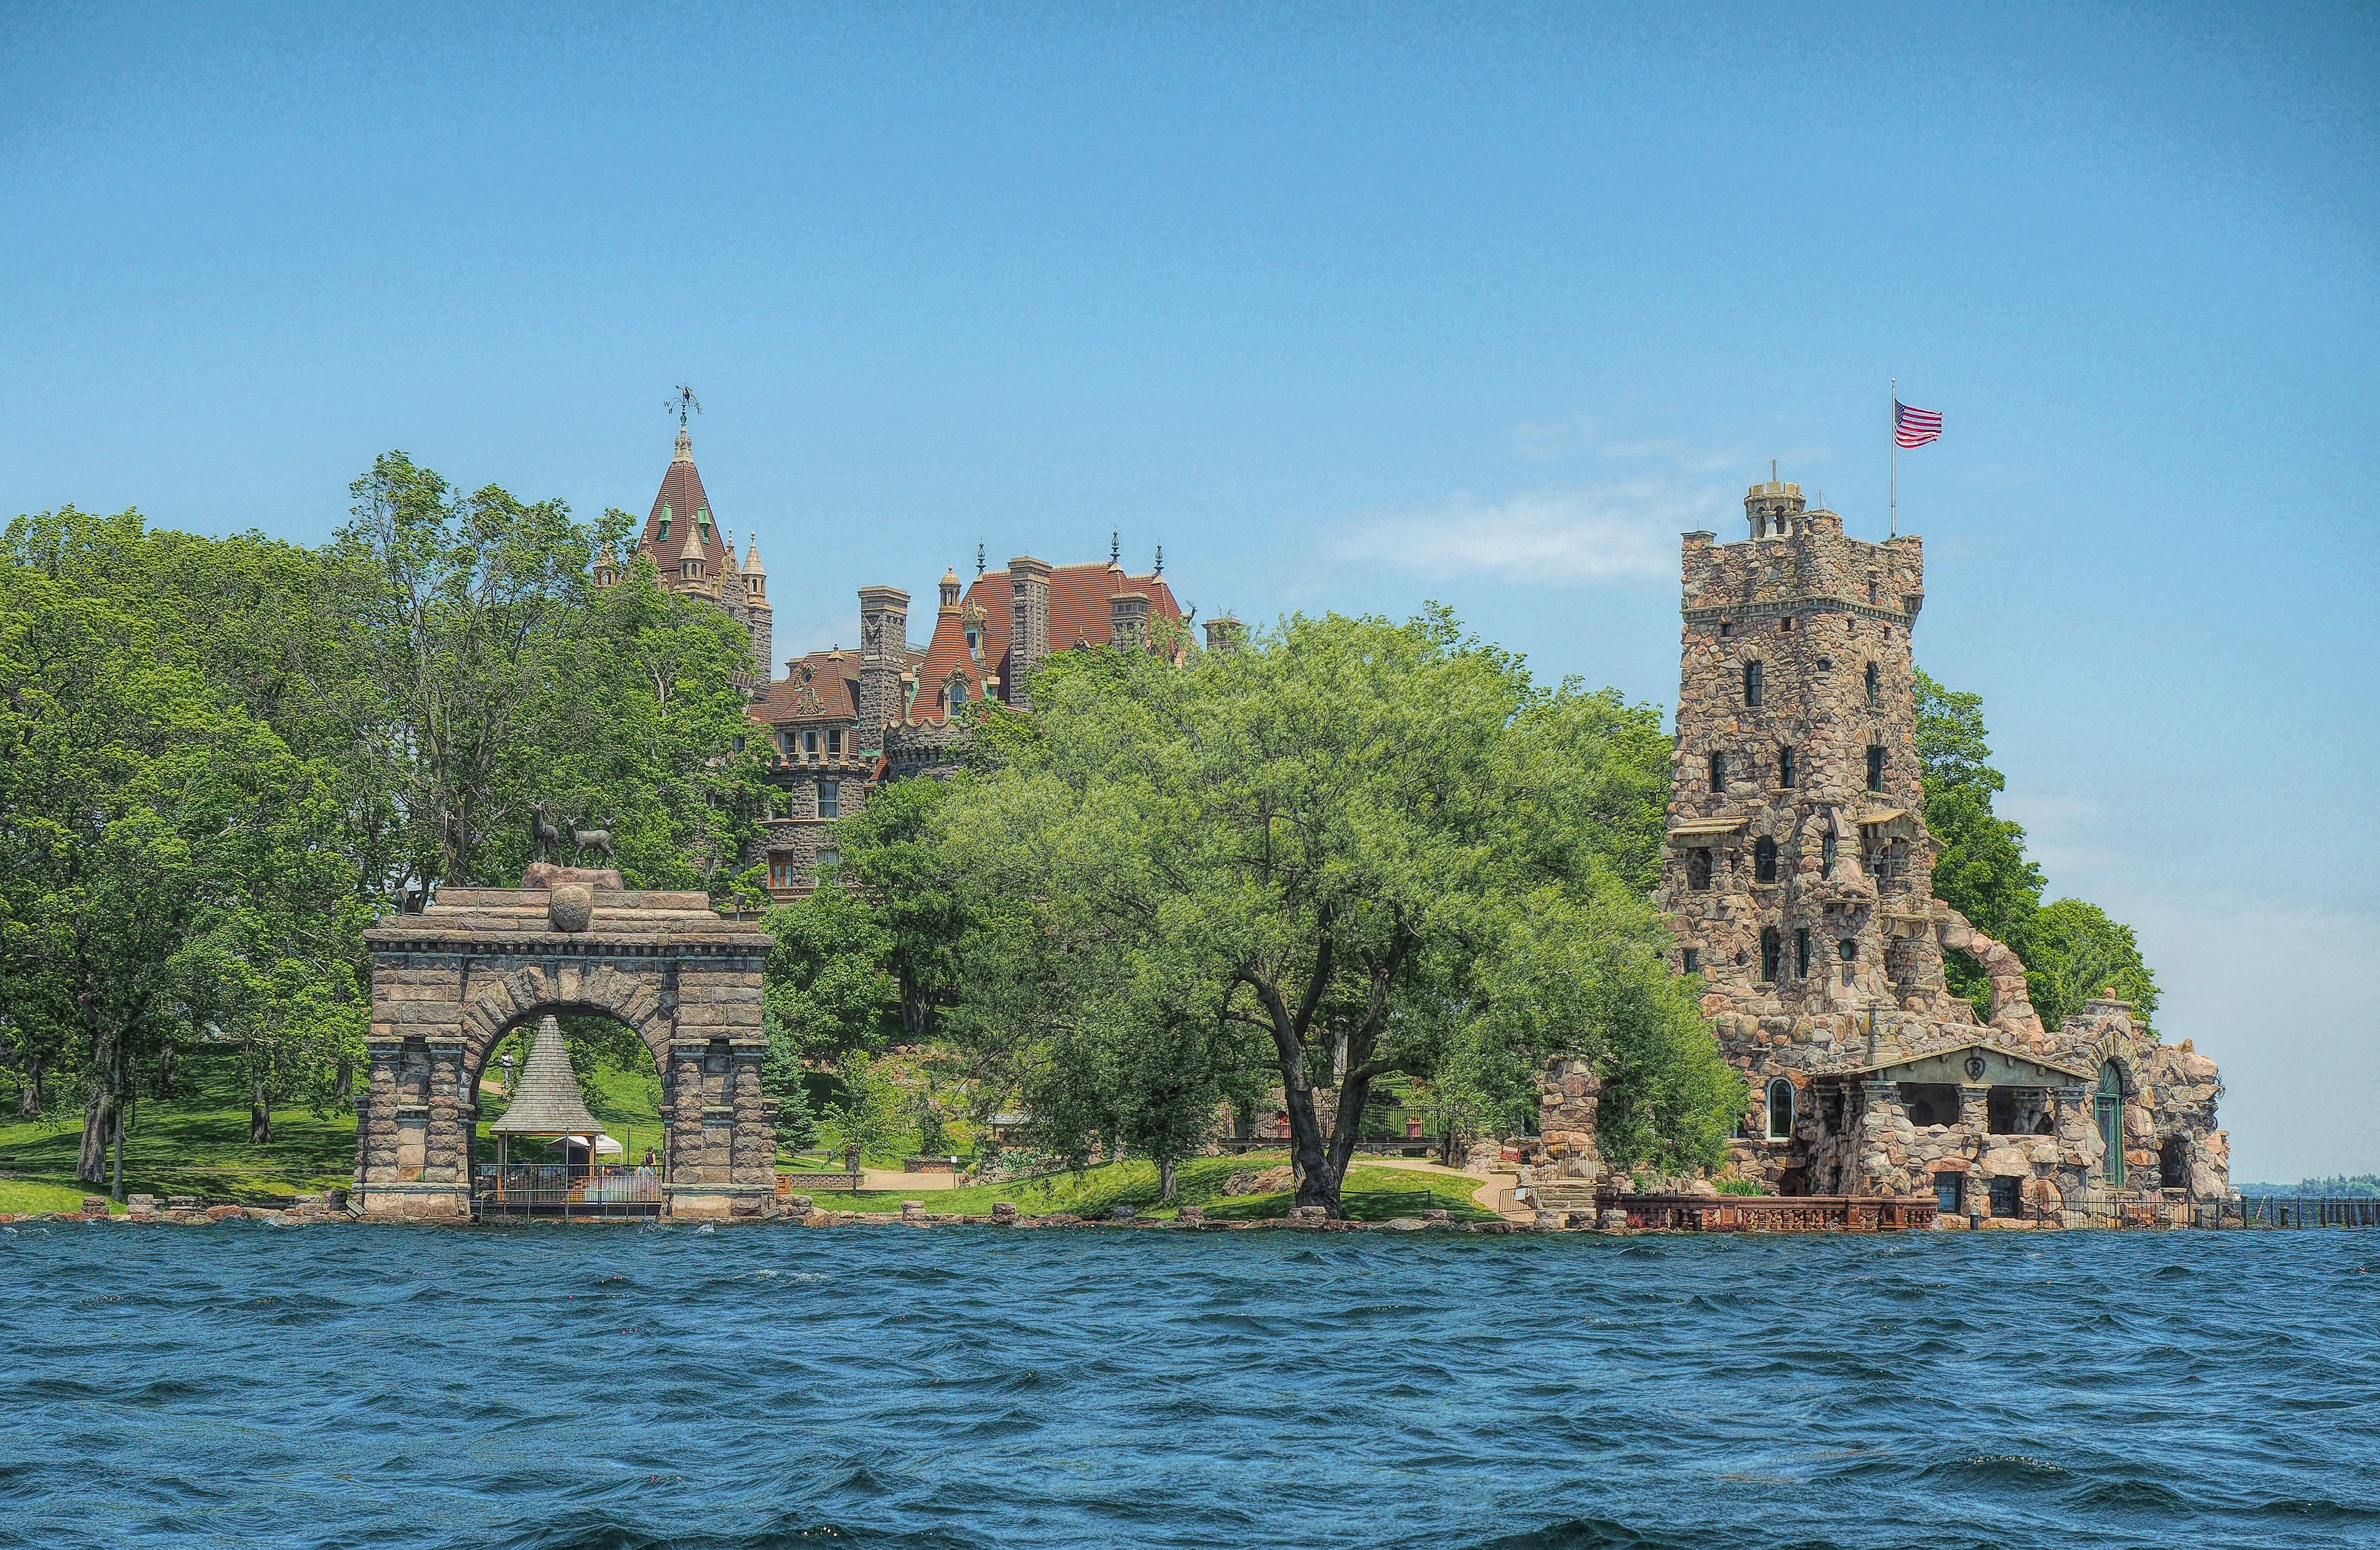 Александрийский залив, Замок Болдт, Канада, Озеро Онтарио, Штат Нью-Йорк, Оттава, Река Святого Лаврентия